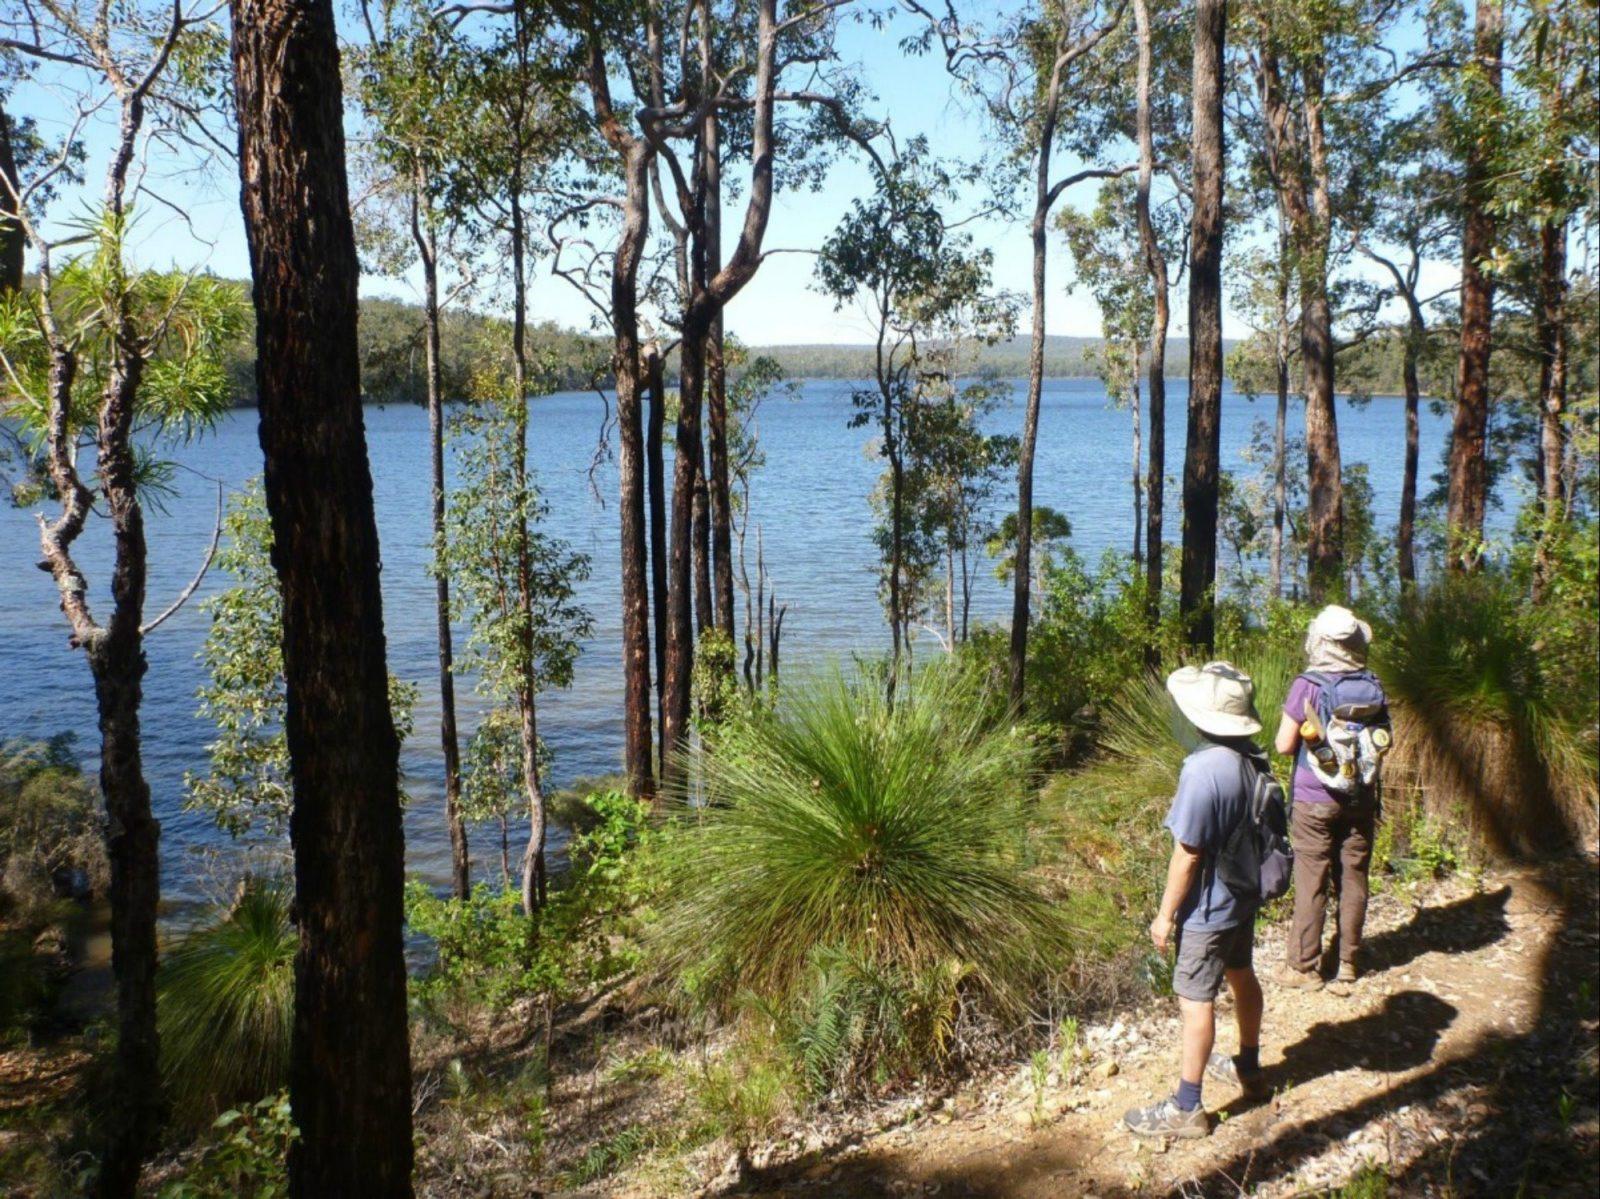 Wellington Discovery Forest, Bunbury, Western Australia